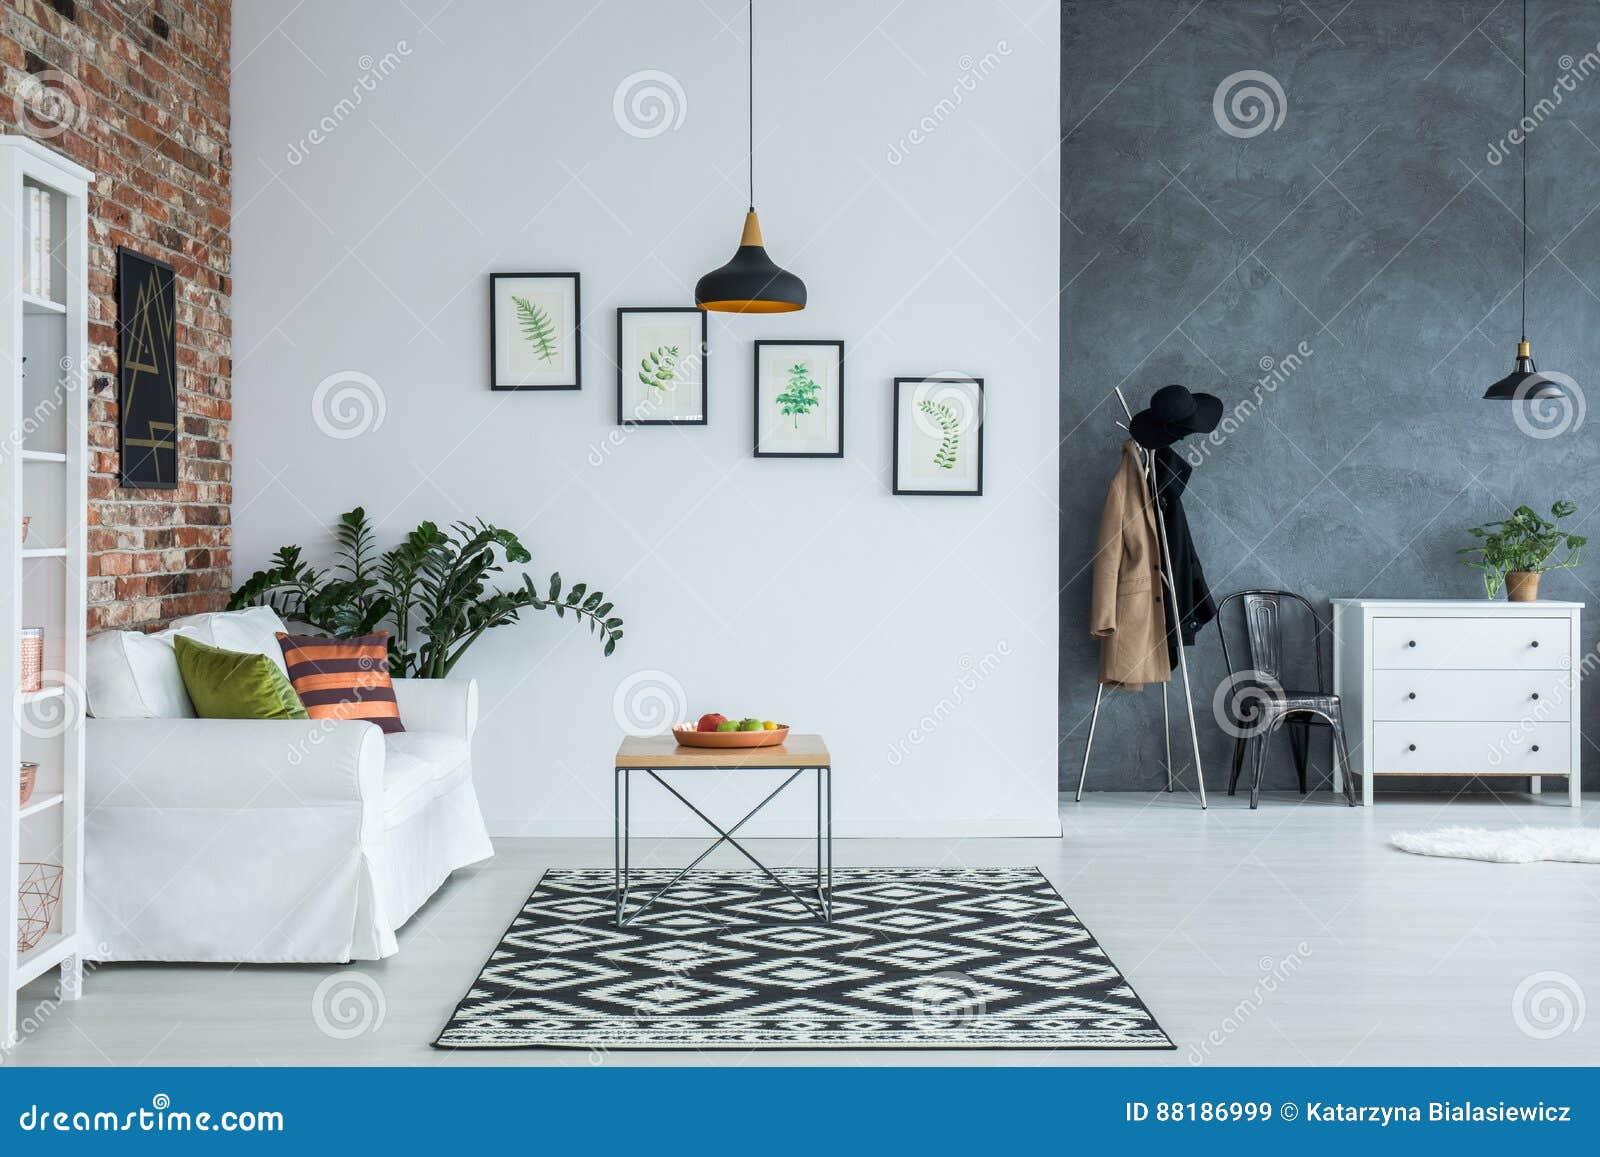 Bright home interior with sofa